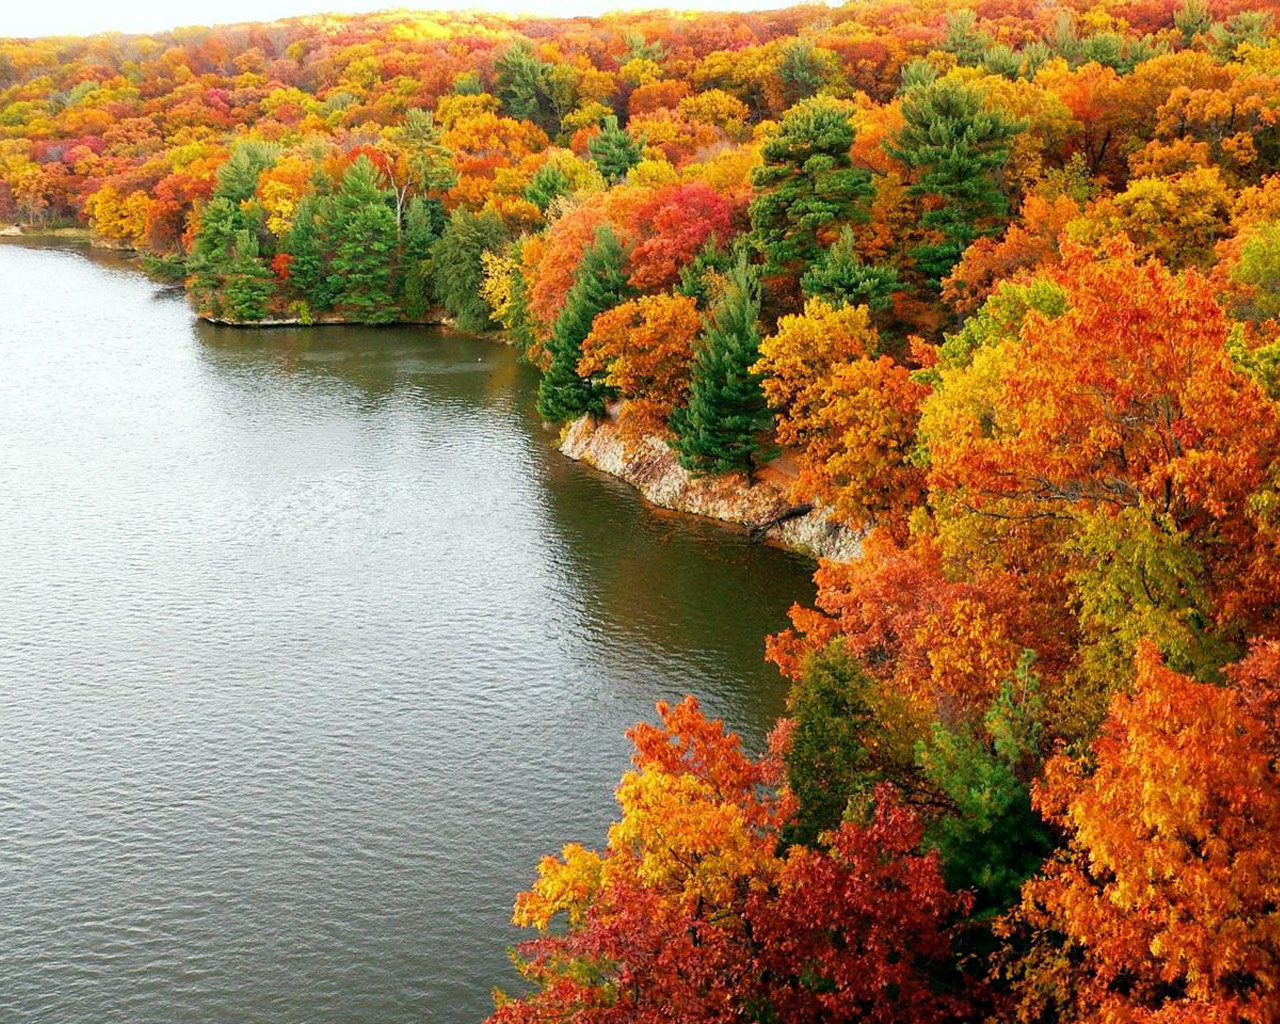 Free Desktop Wallpaper Autumn Scenery